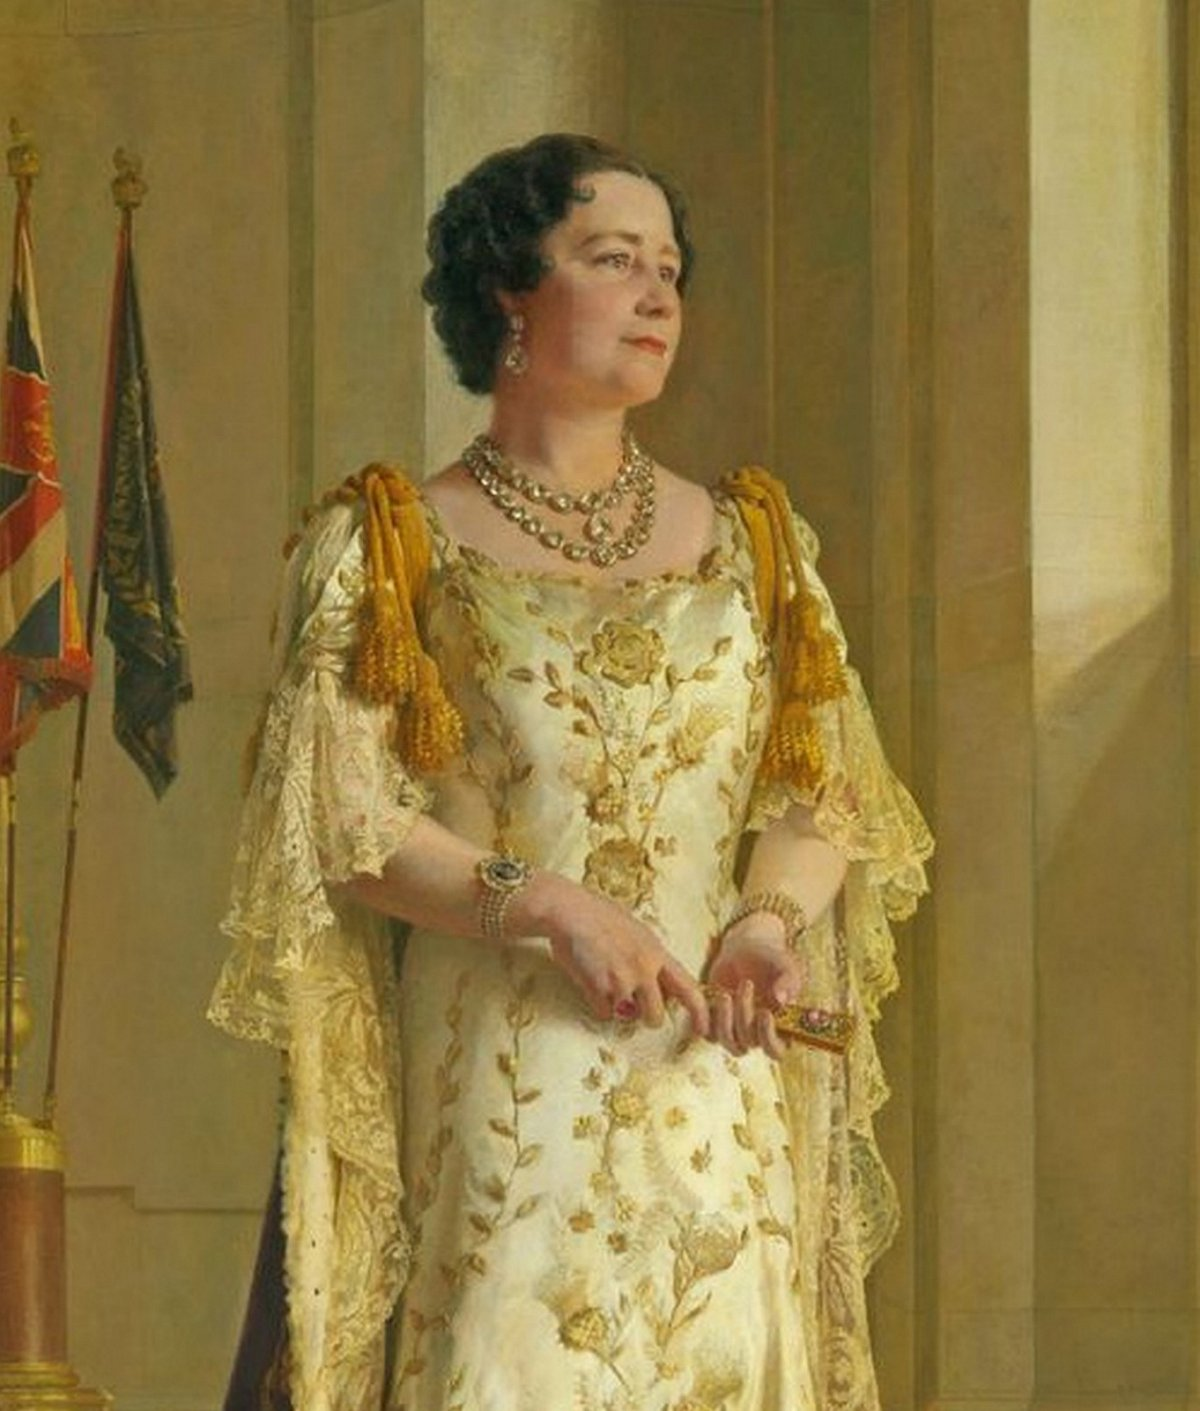 Queen Elizabeth's Coronation Portrait (1937)